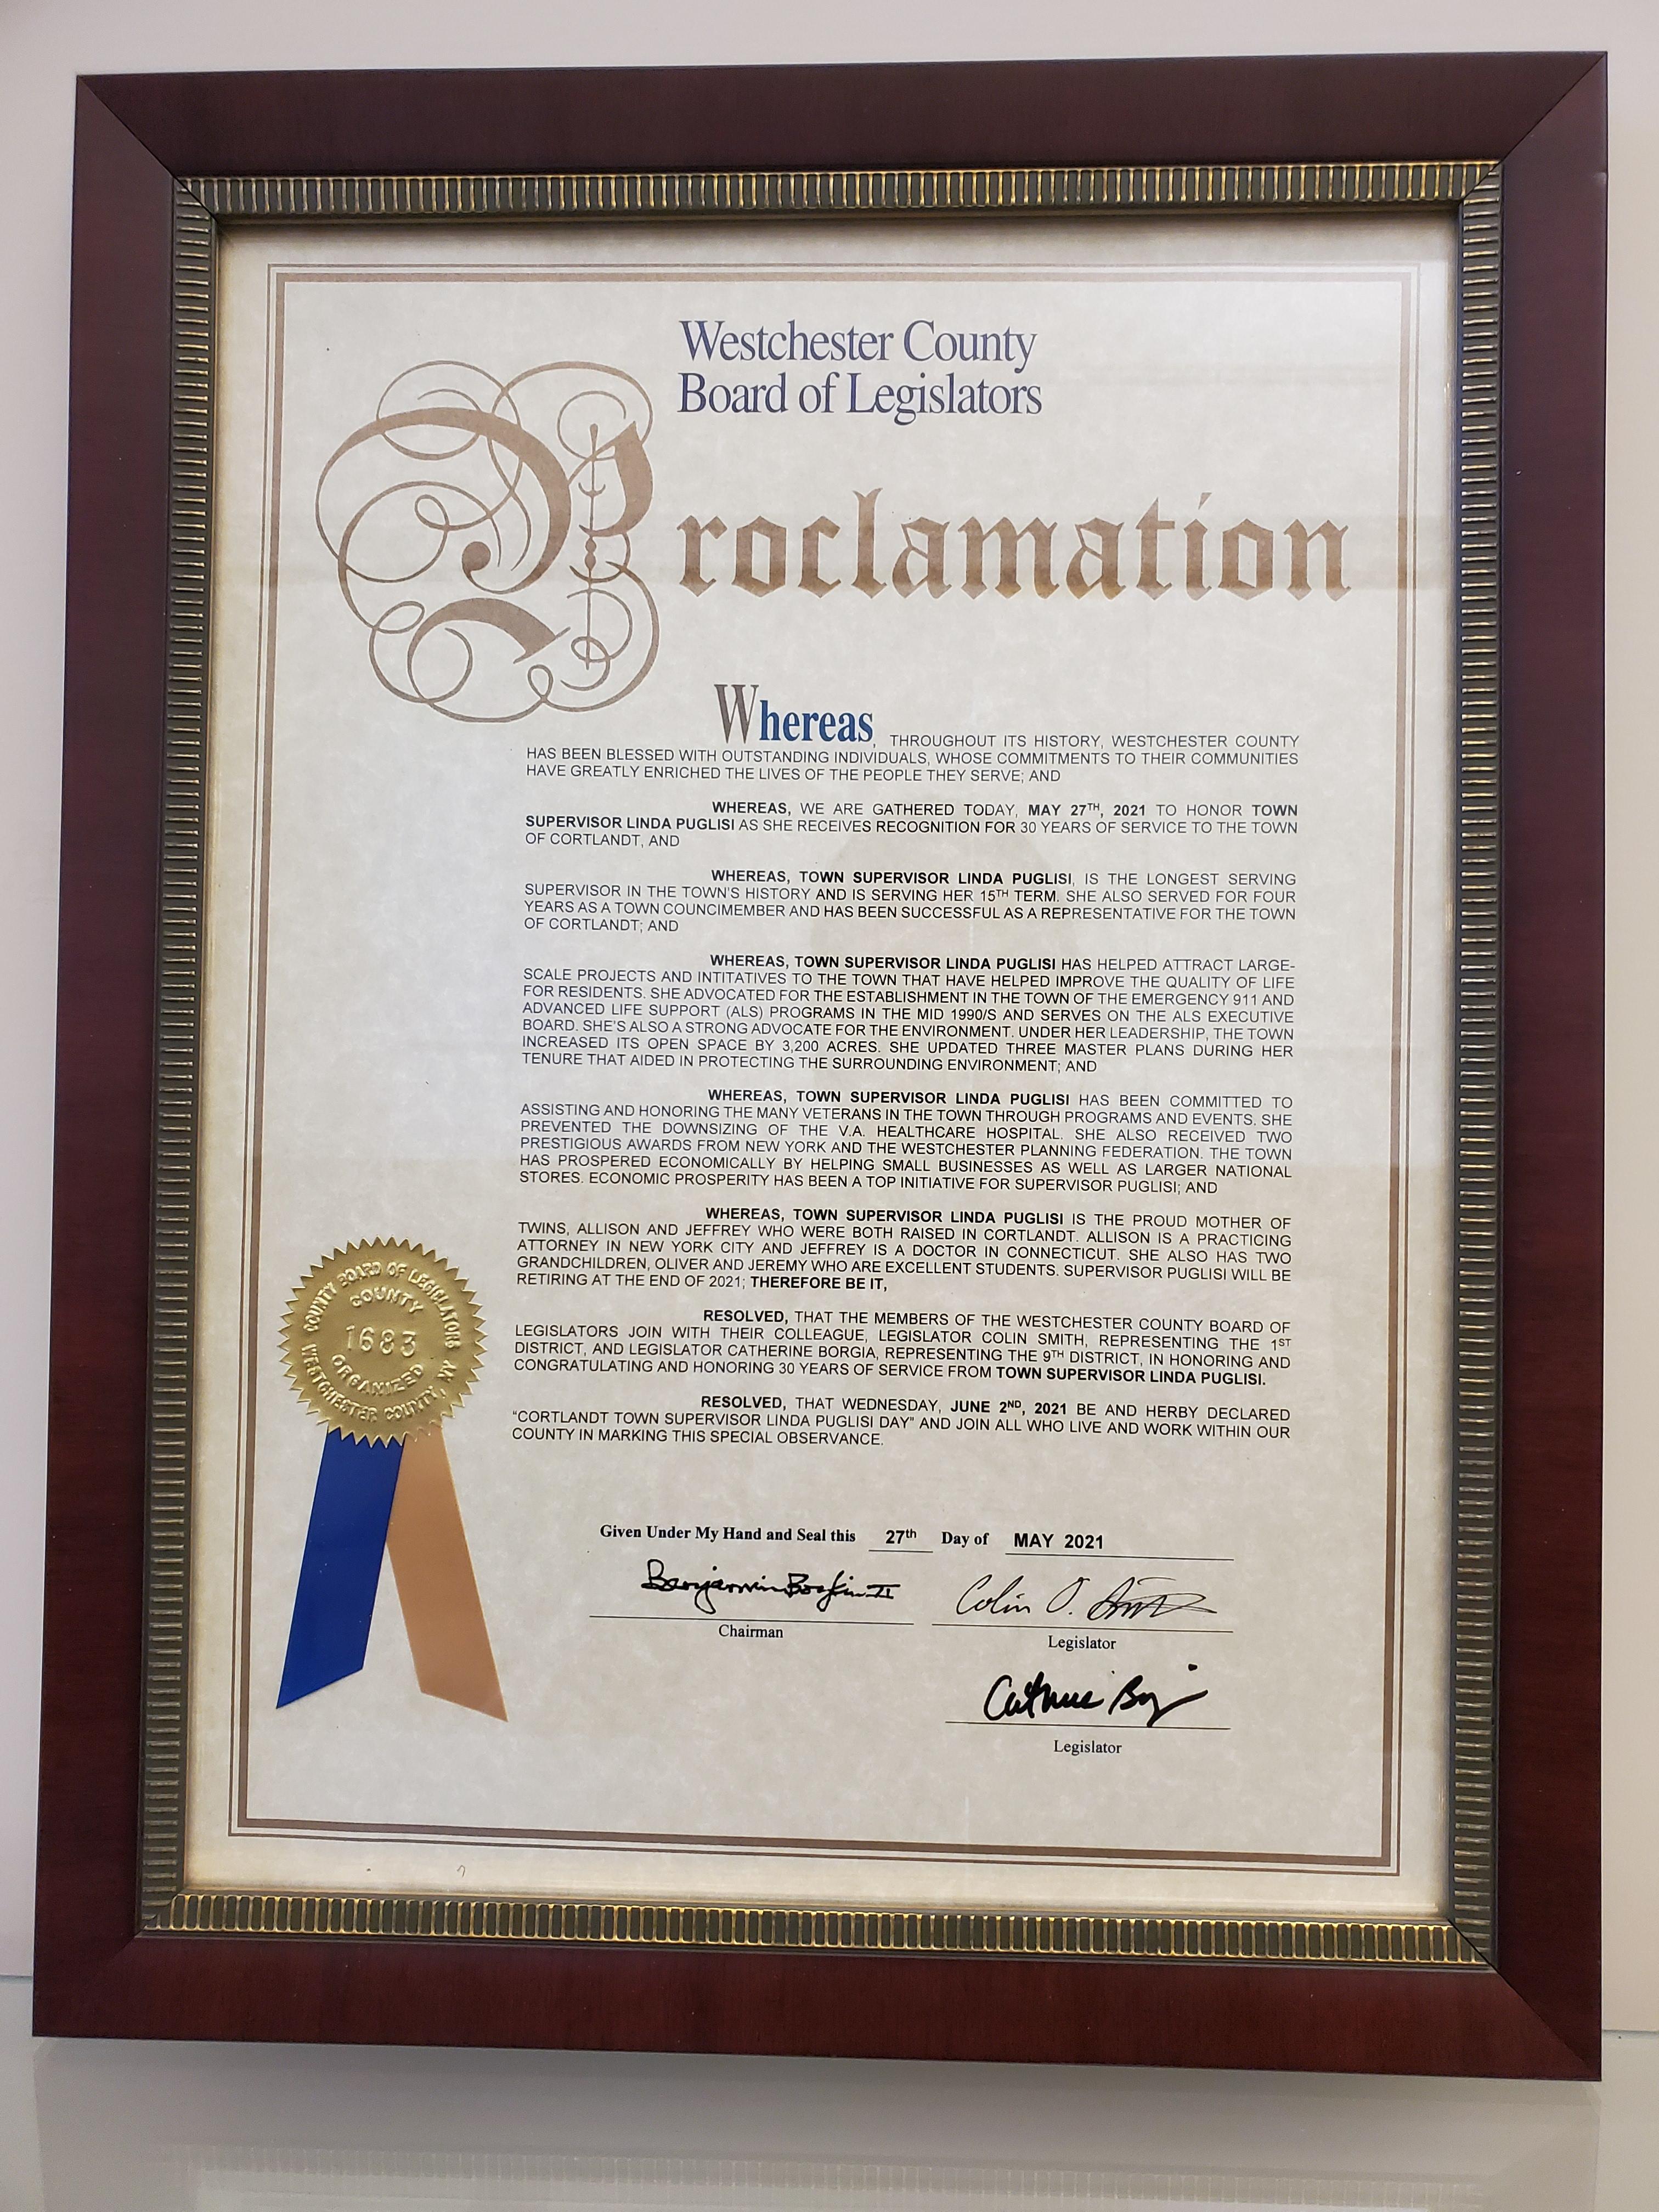 Proclamation_From_WC_Board_of_Legislators.jpg